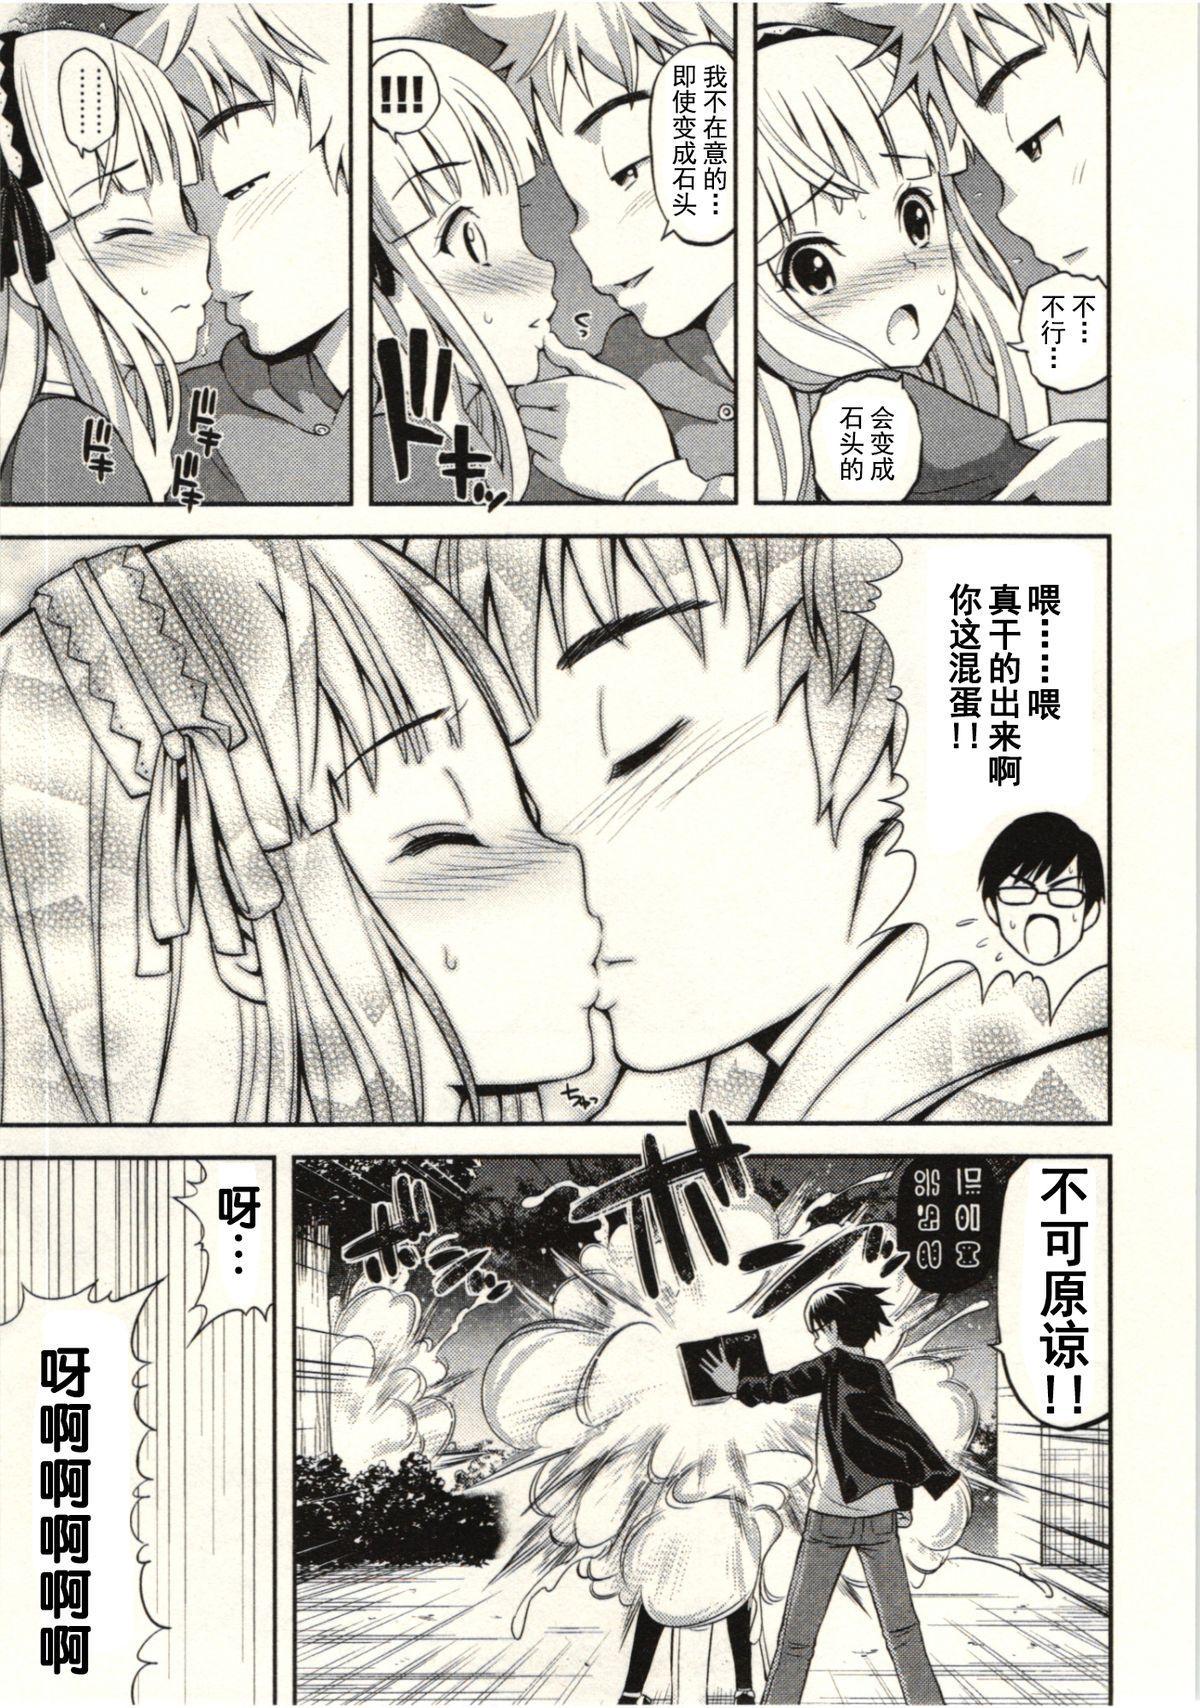 Tadashii Majutsu no Asobikata - The right way of playing of magic. 129